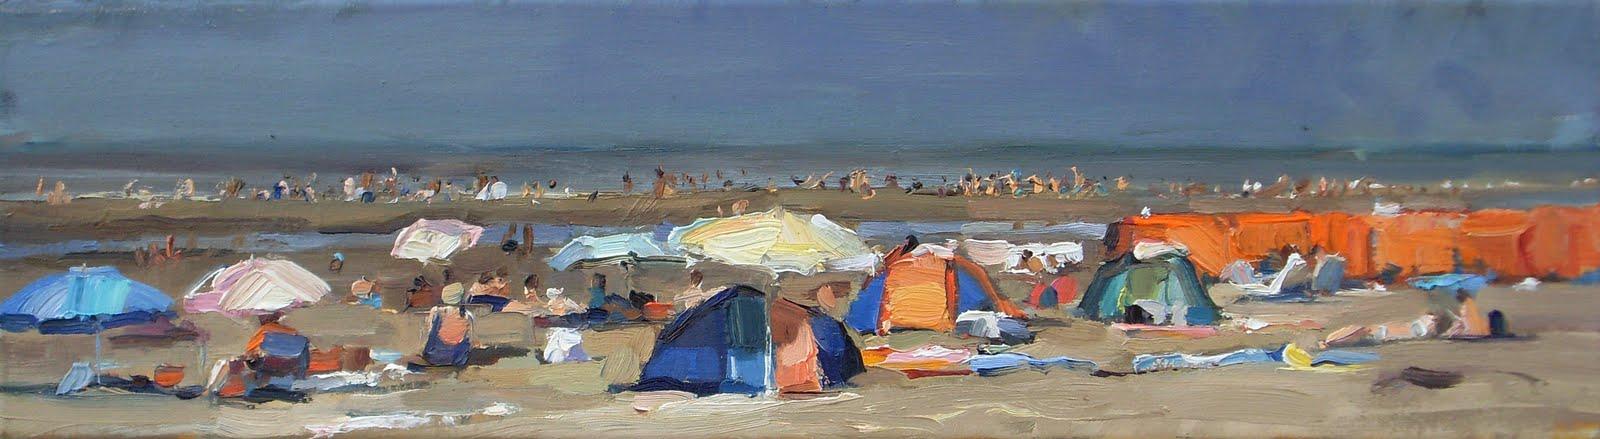 """Laatste zomerse dag misschien - Last summersday"" original fine art by Roos Schuring"